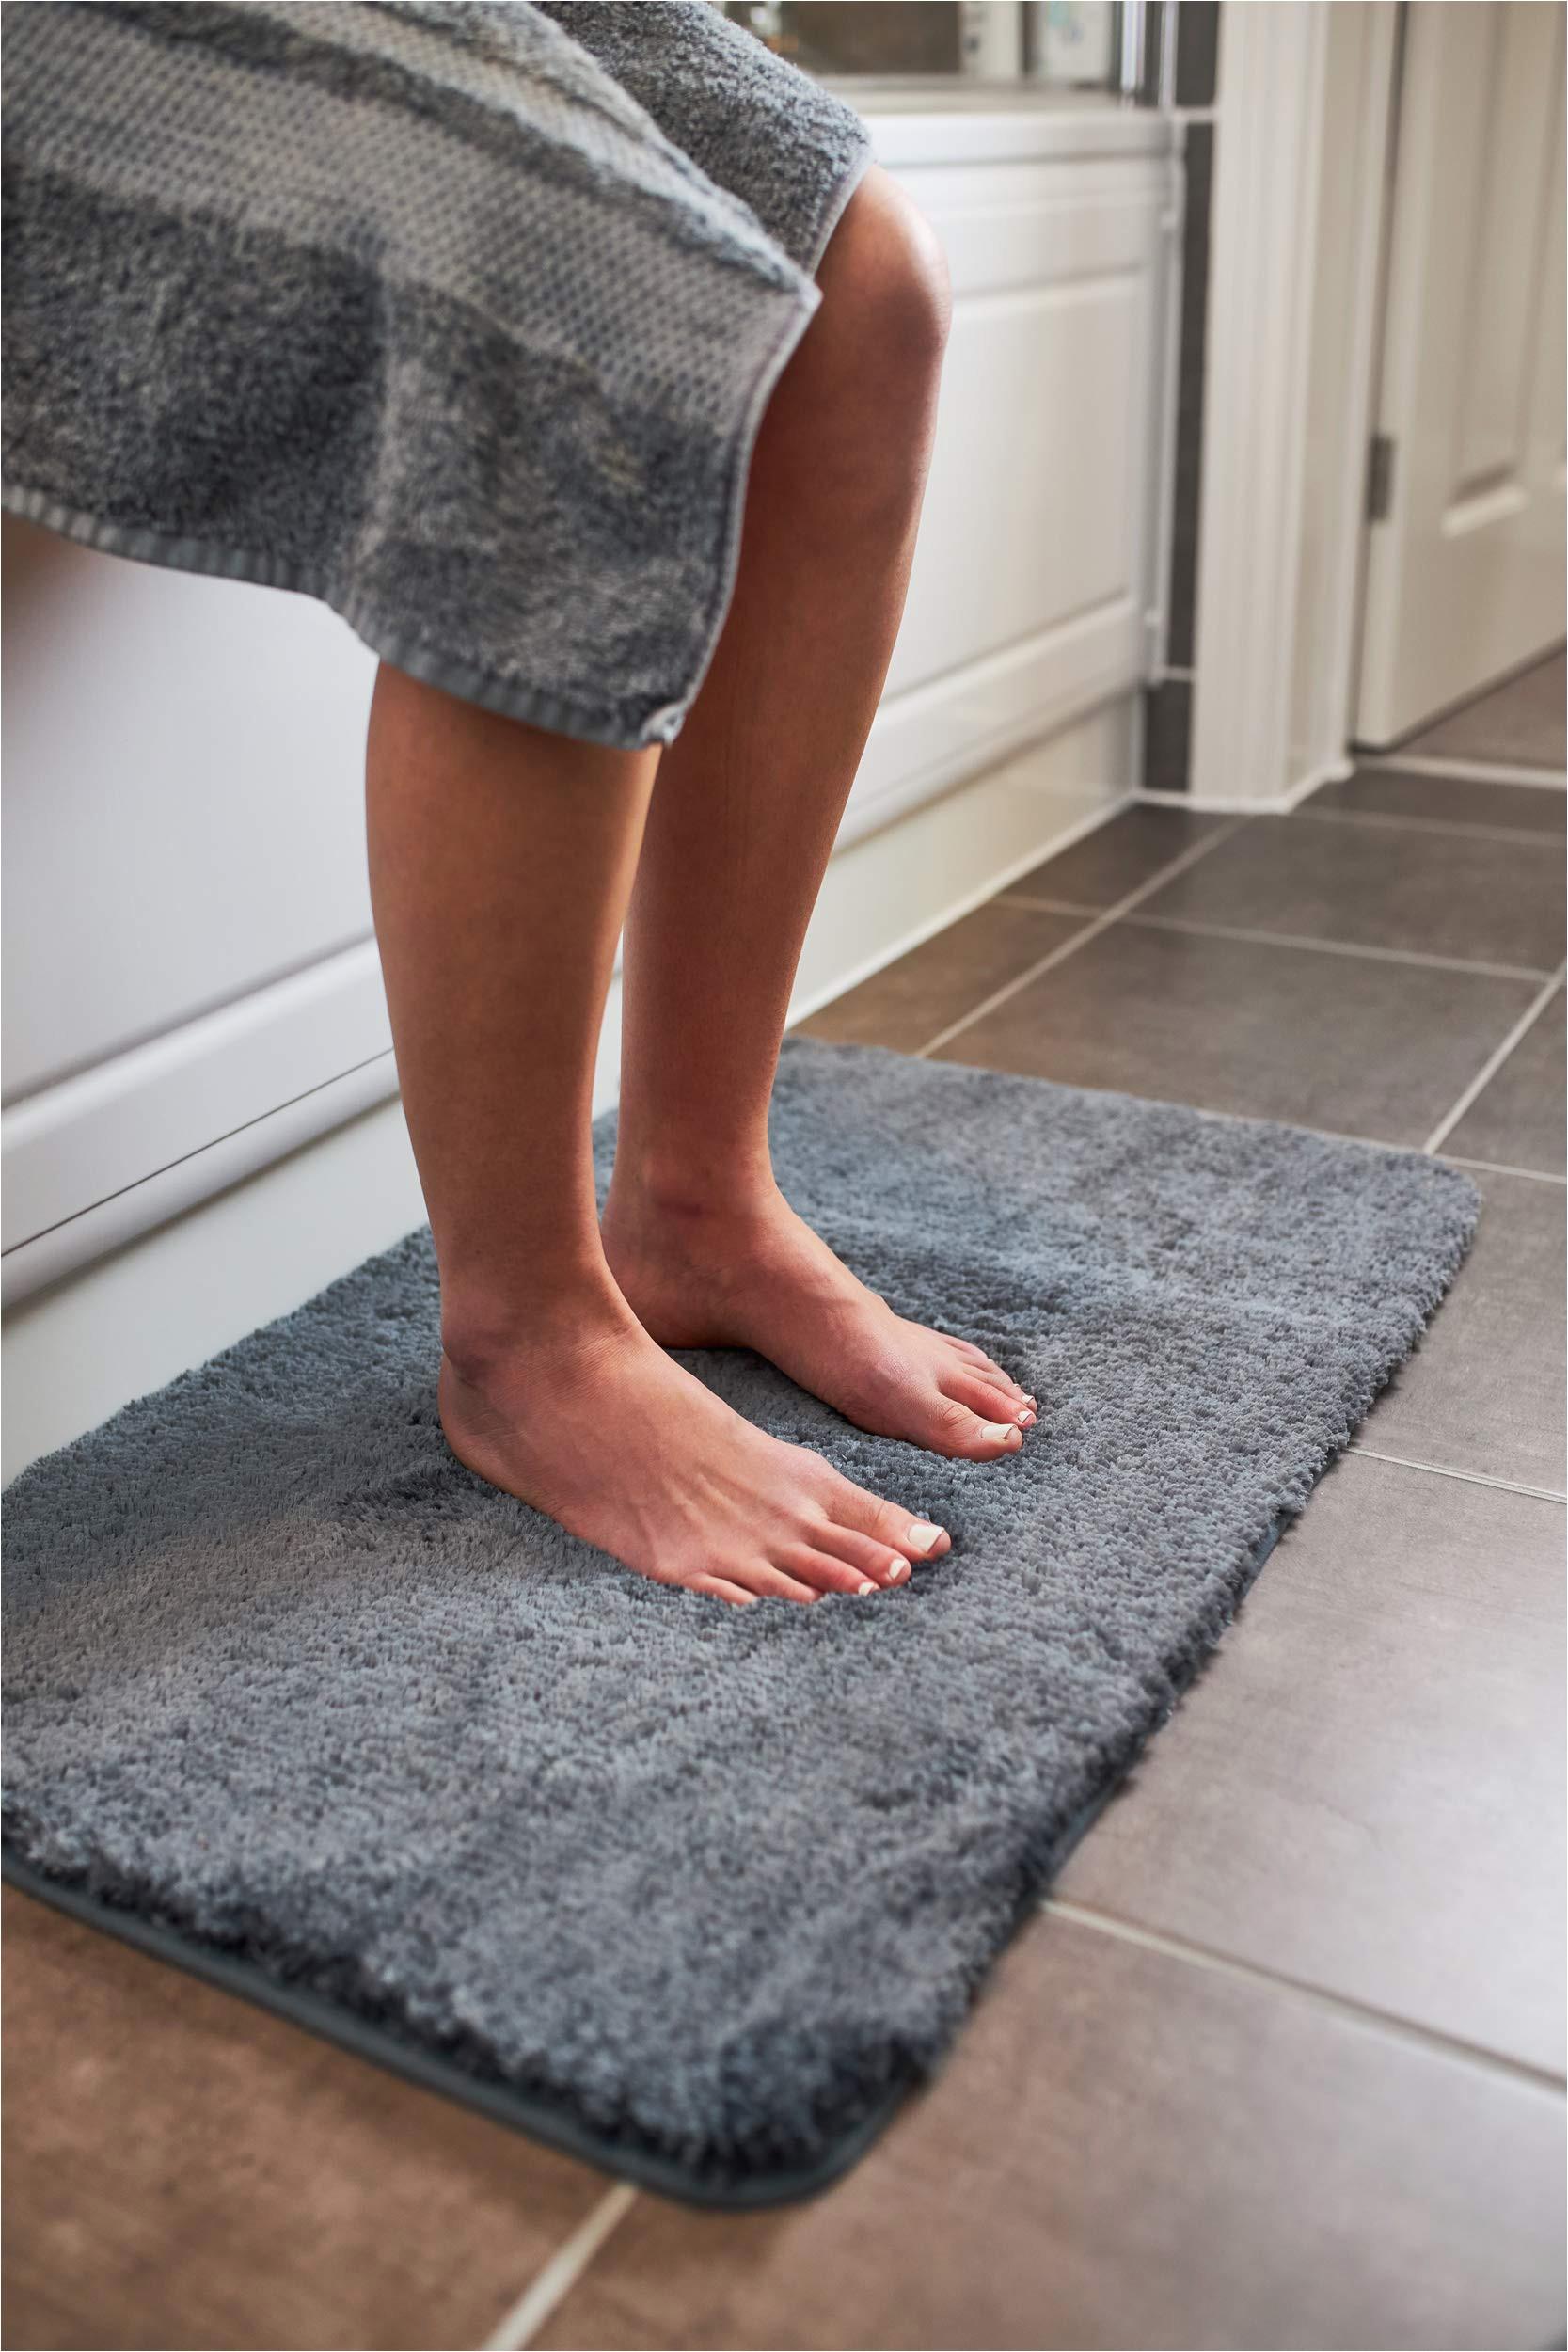 Light Grey Bath Rug Luxury Grey Bath Mat Microfiber Non Slip Bath Rug with Super soft Absorbent Dry Fast Design for Bath and Shower